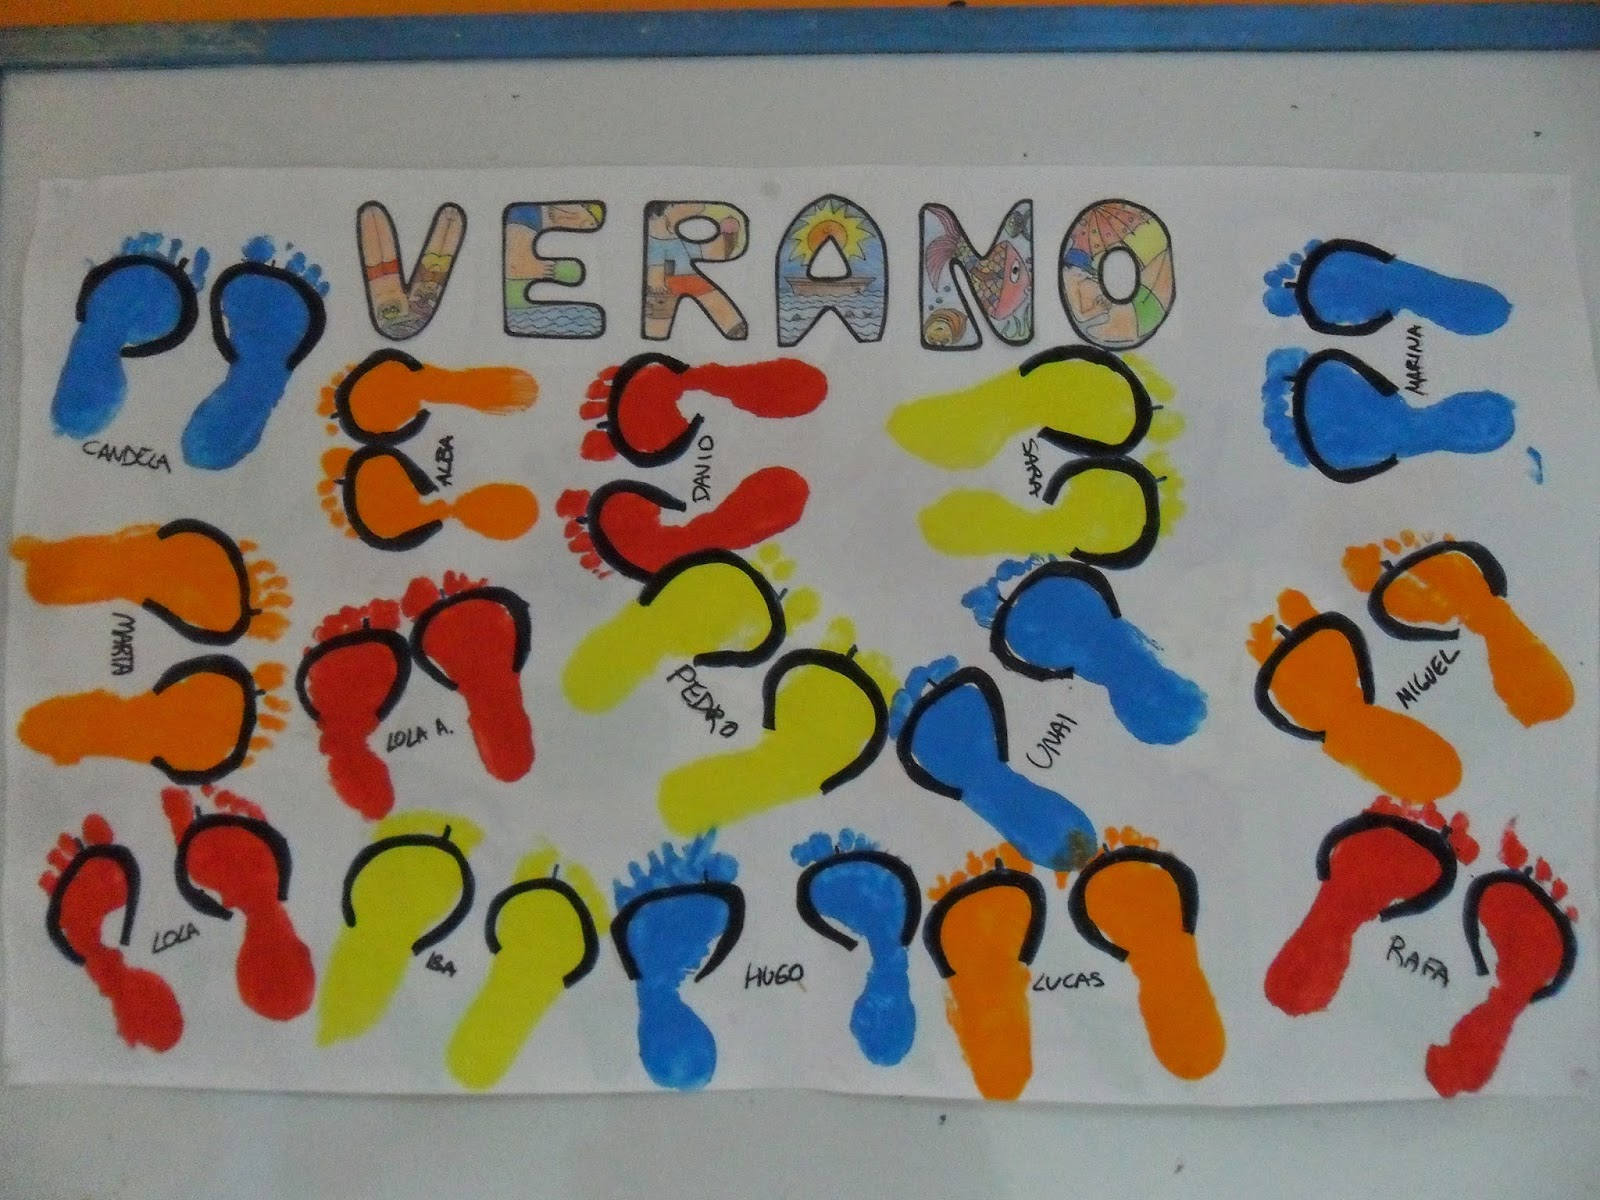 Materiales para educaci n infantil verano verano for Decoracion verano jardin infantil